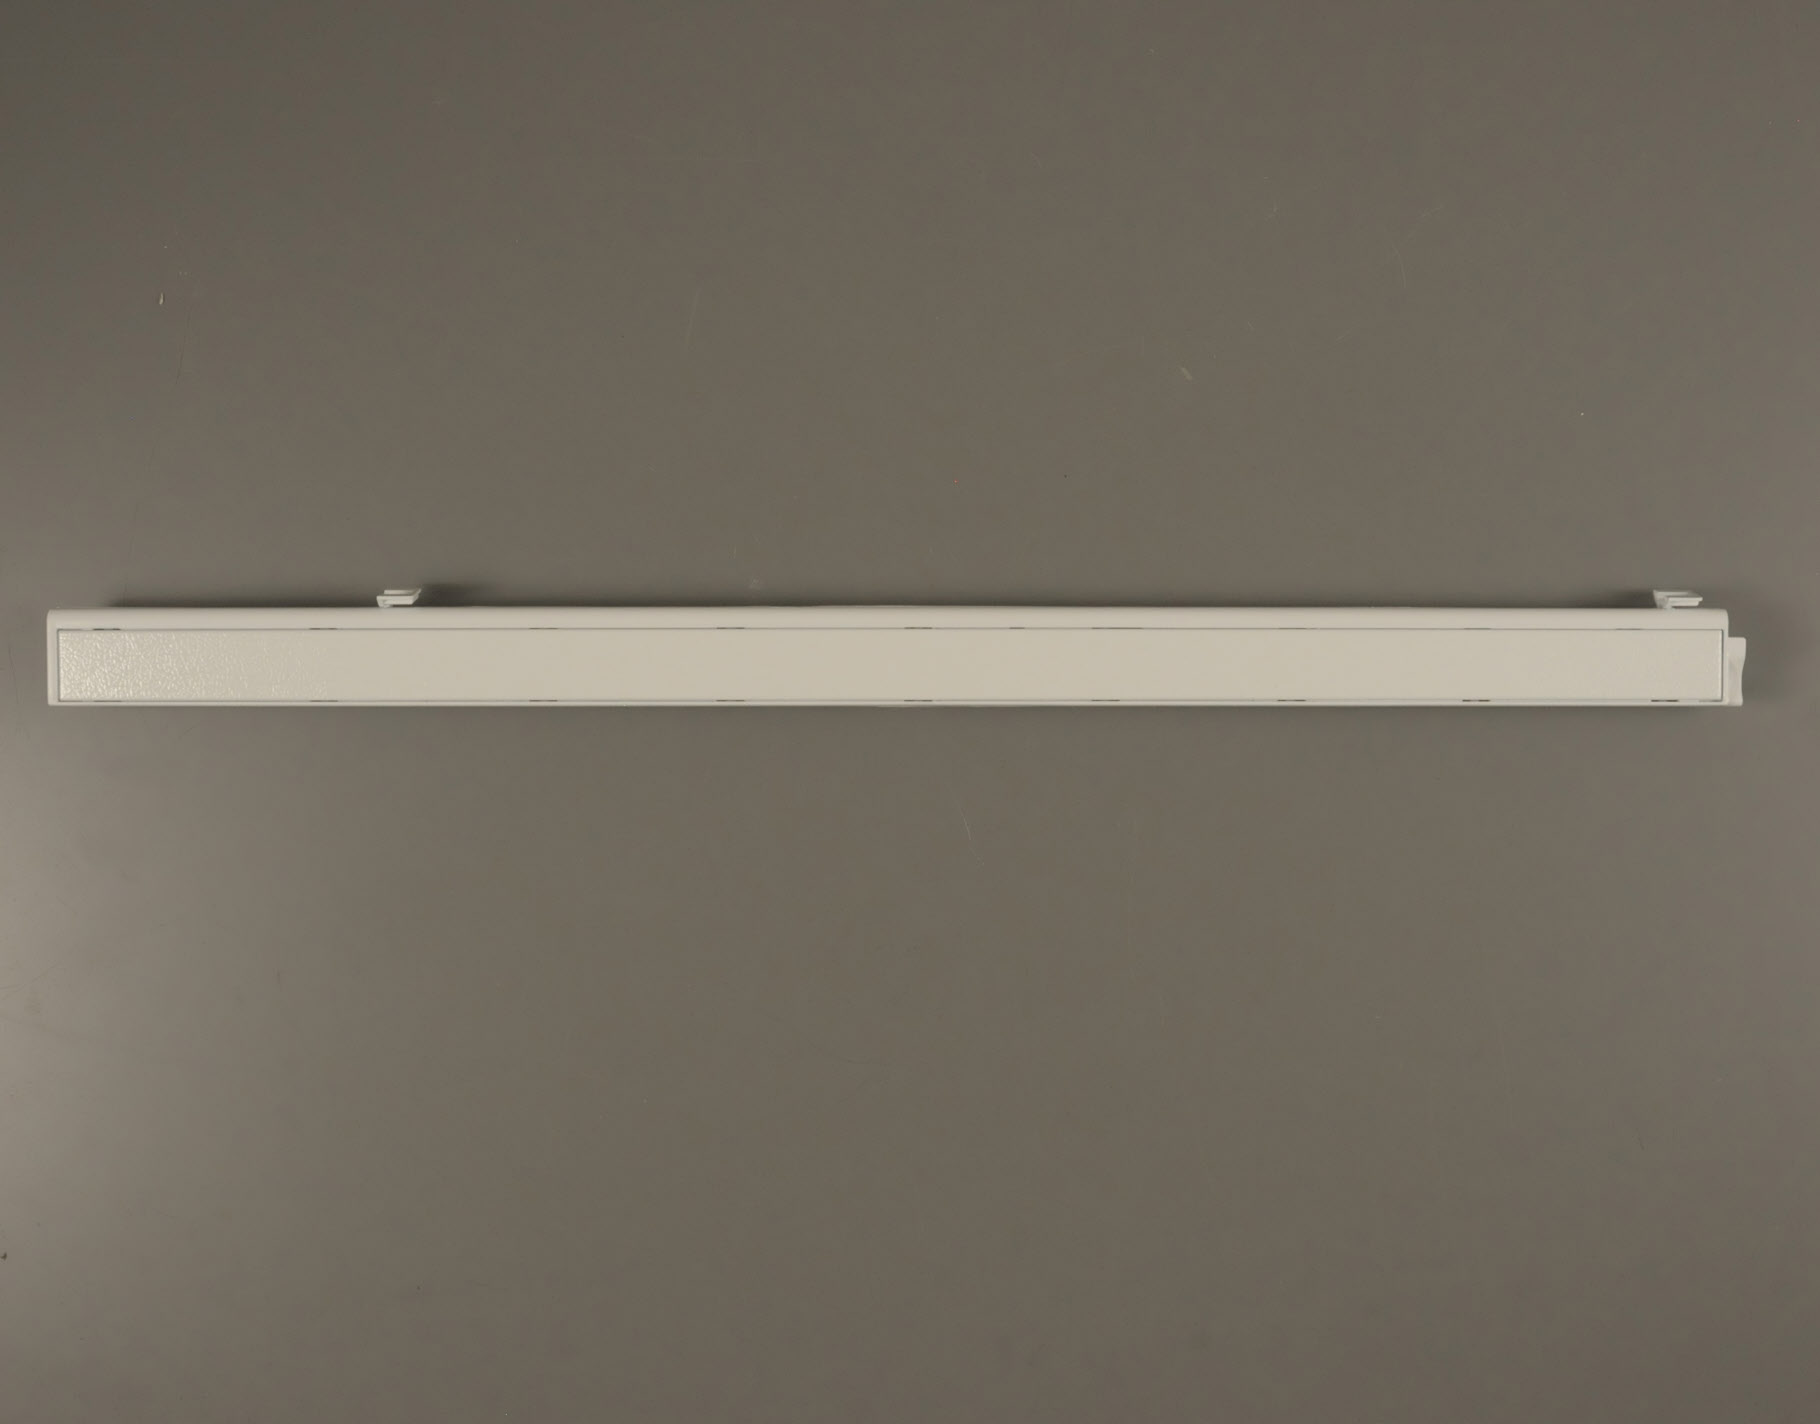 Jenn Air Refrigerator Part # WP12722803W - Door Support